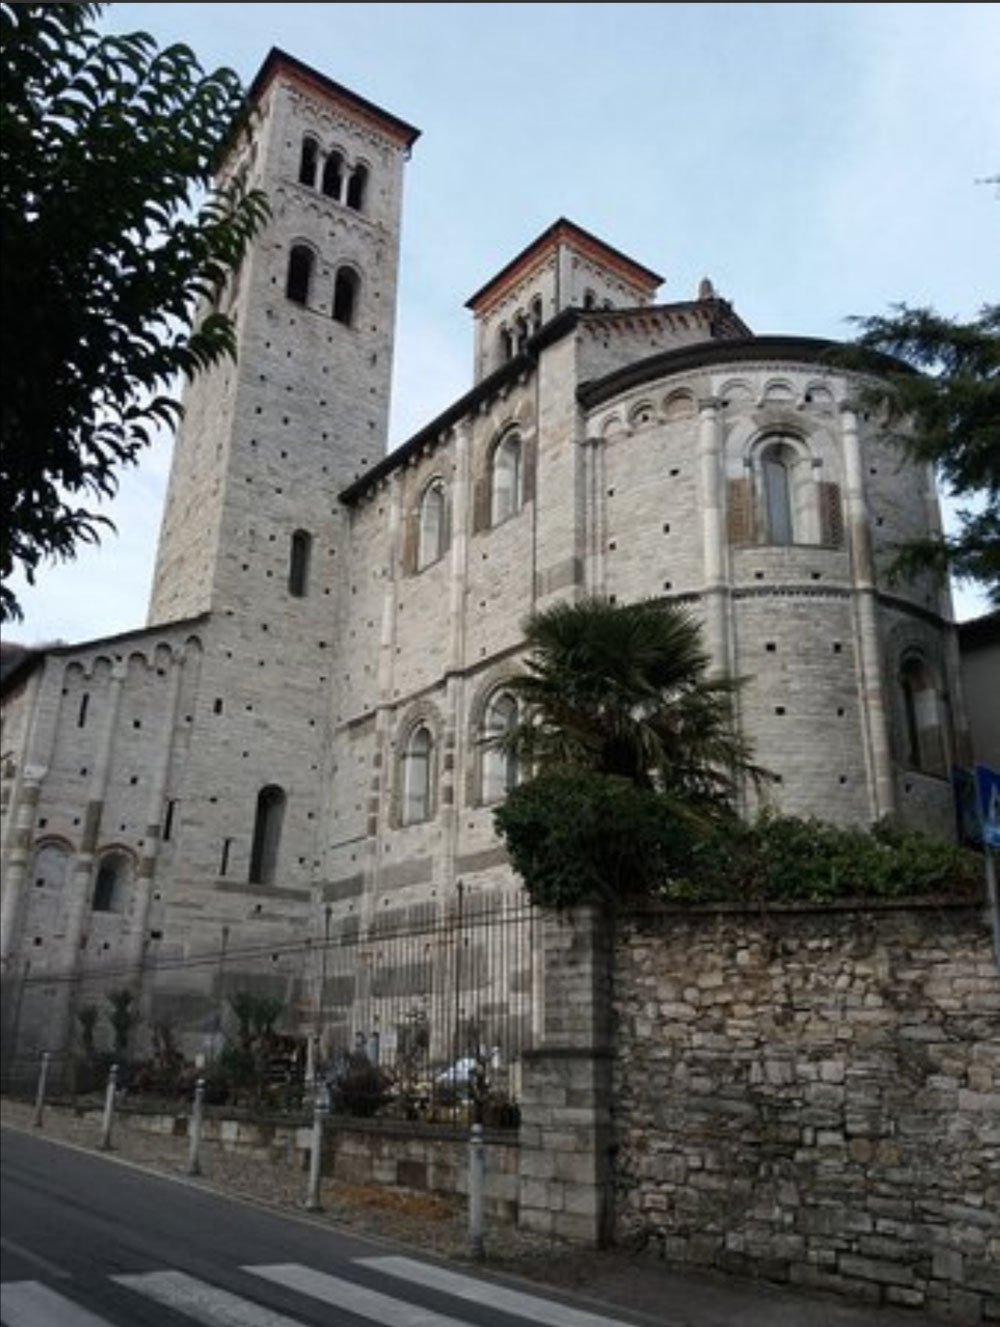 Sant'Abbondio, Como